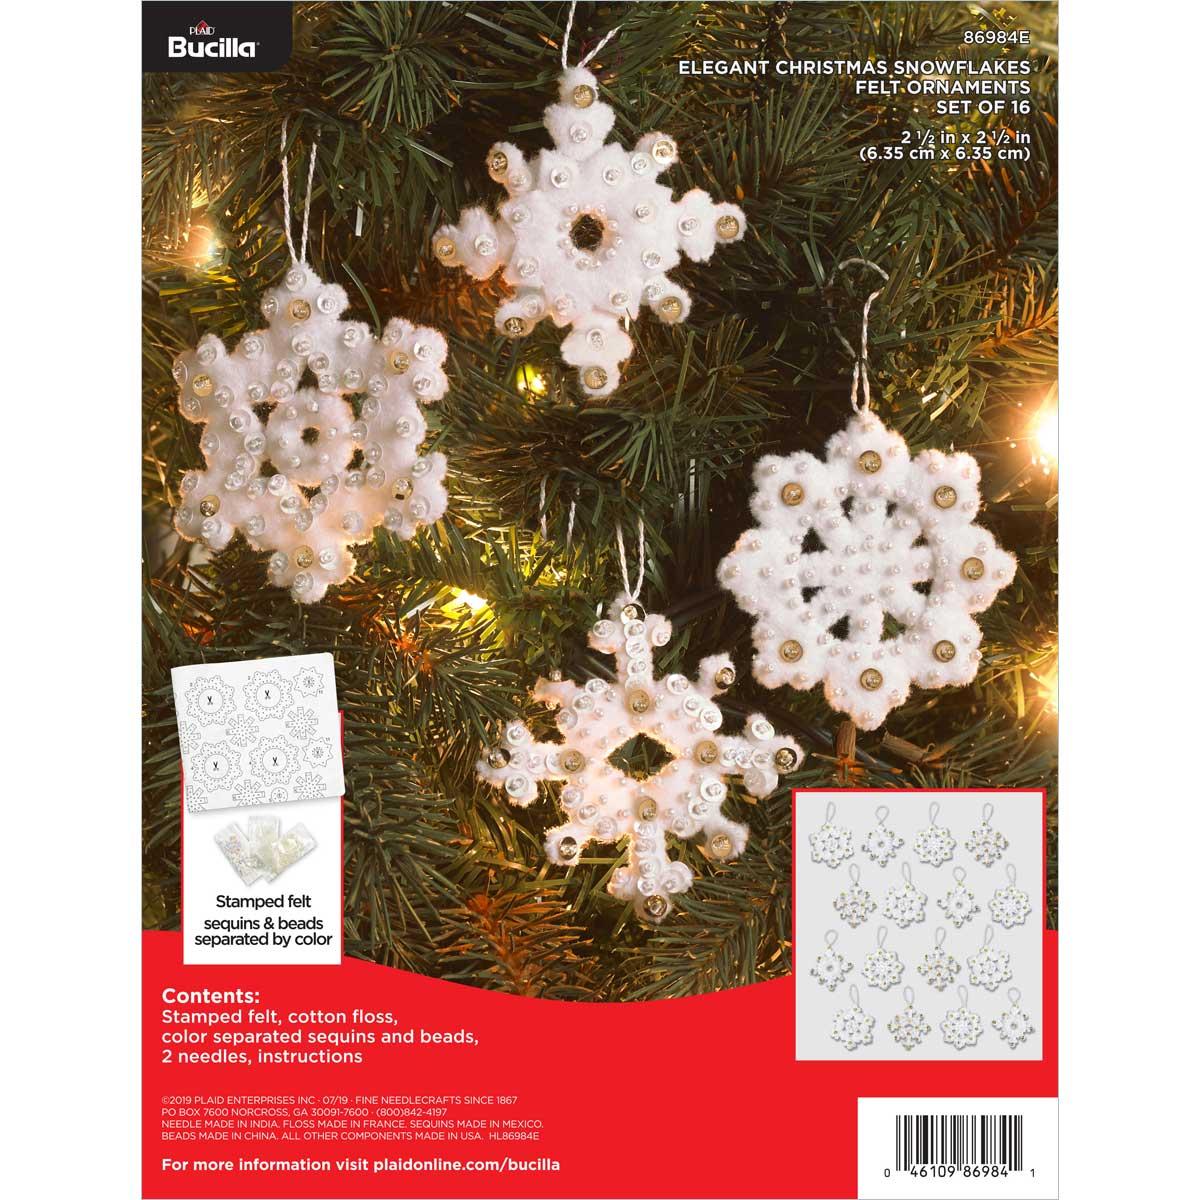 Bucilla ® Seasonal - Felt - Ornament Kits - Elegant Christmas Snowflakes